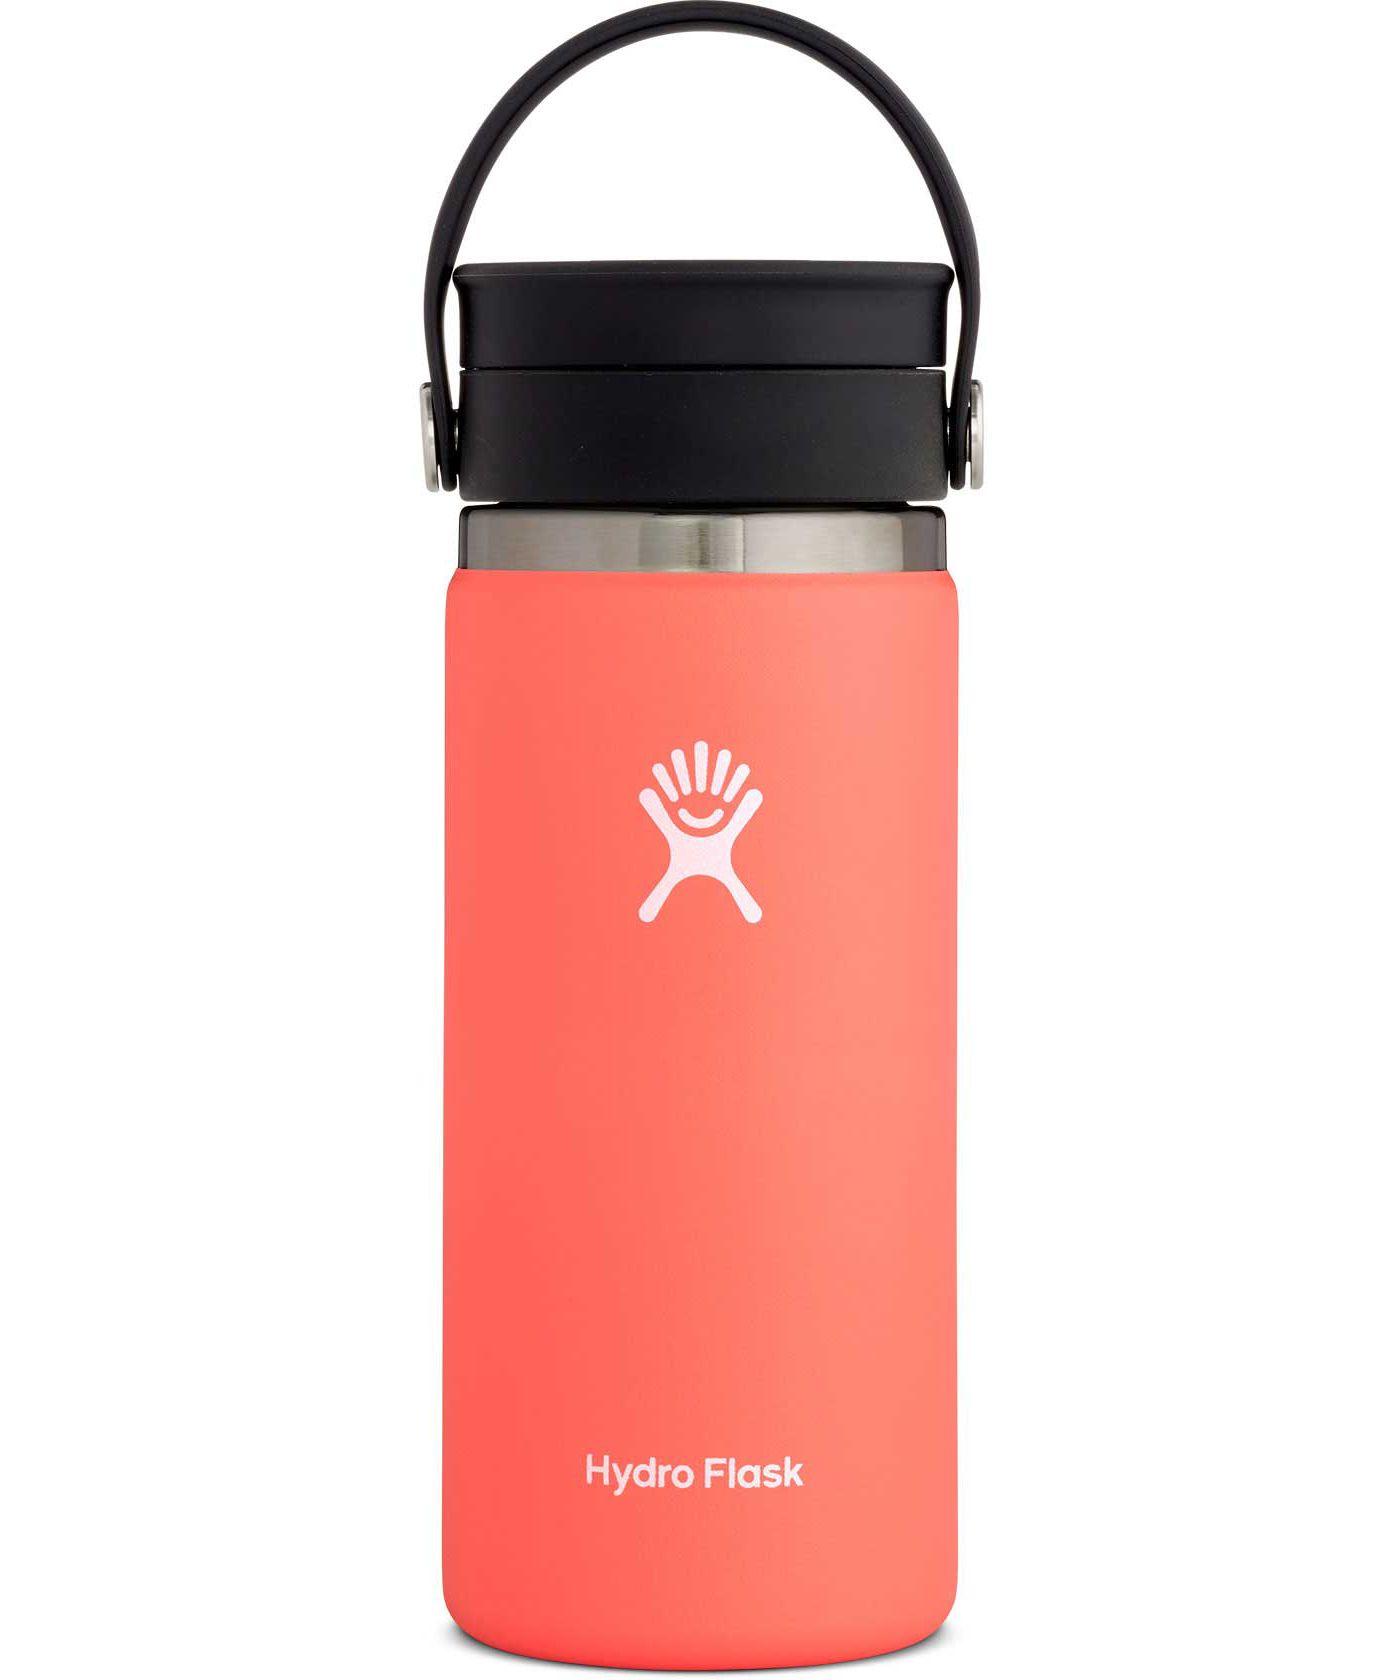 Hydro Flask Coffee